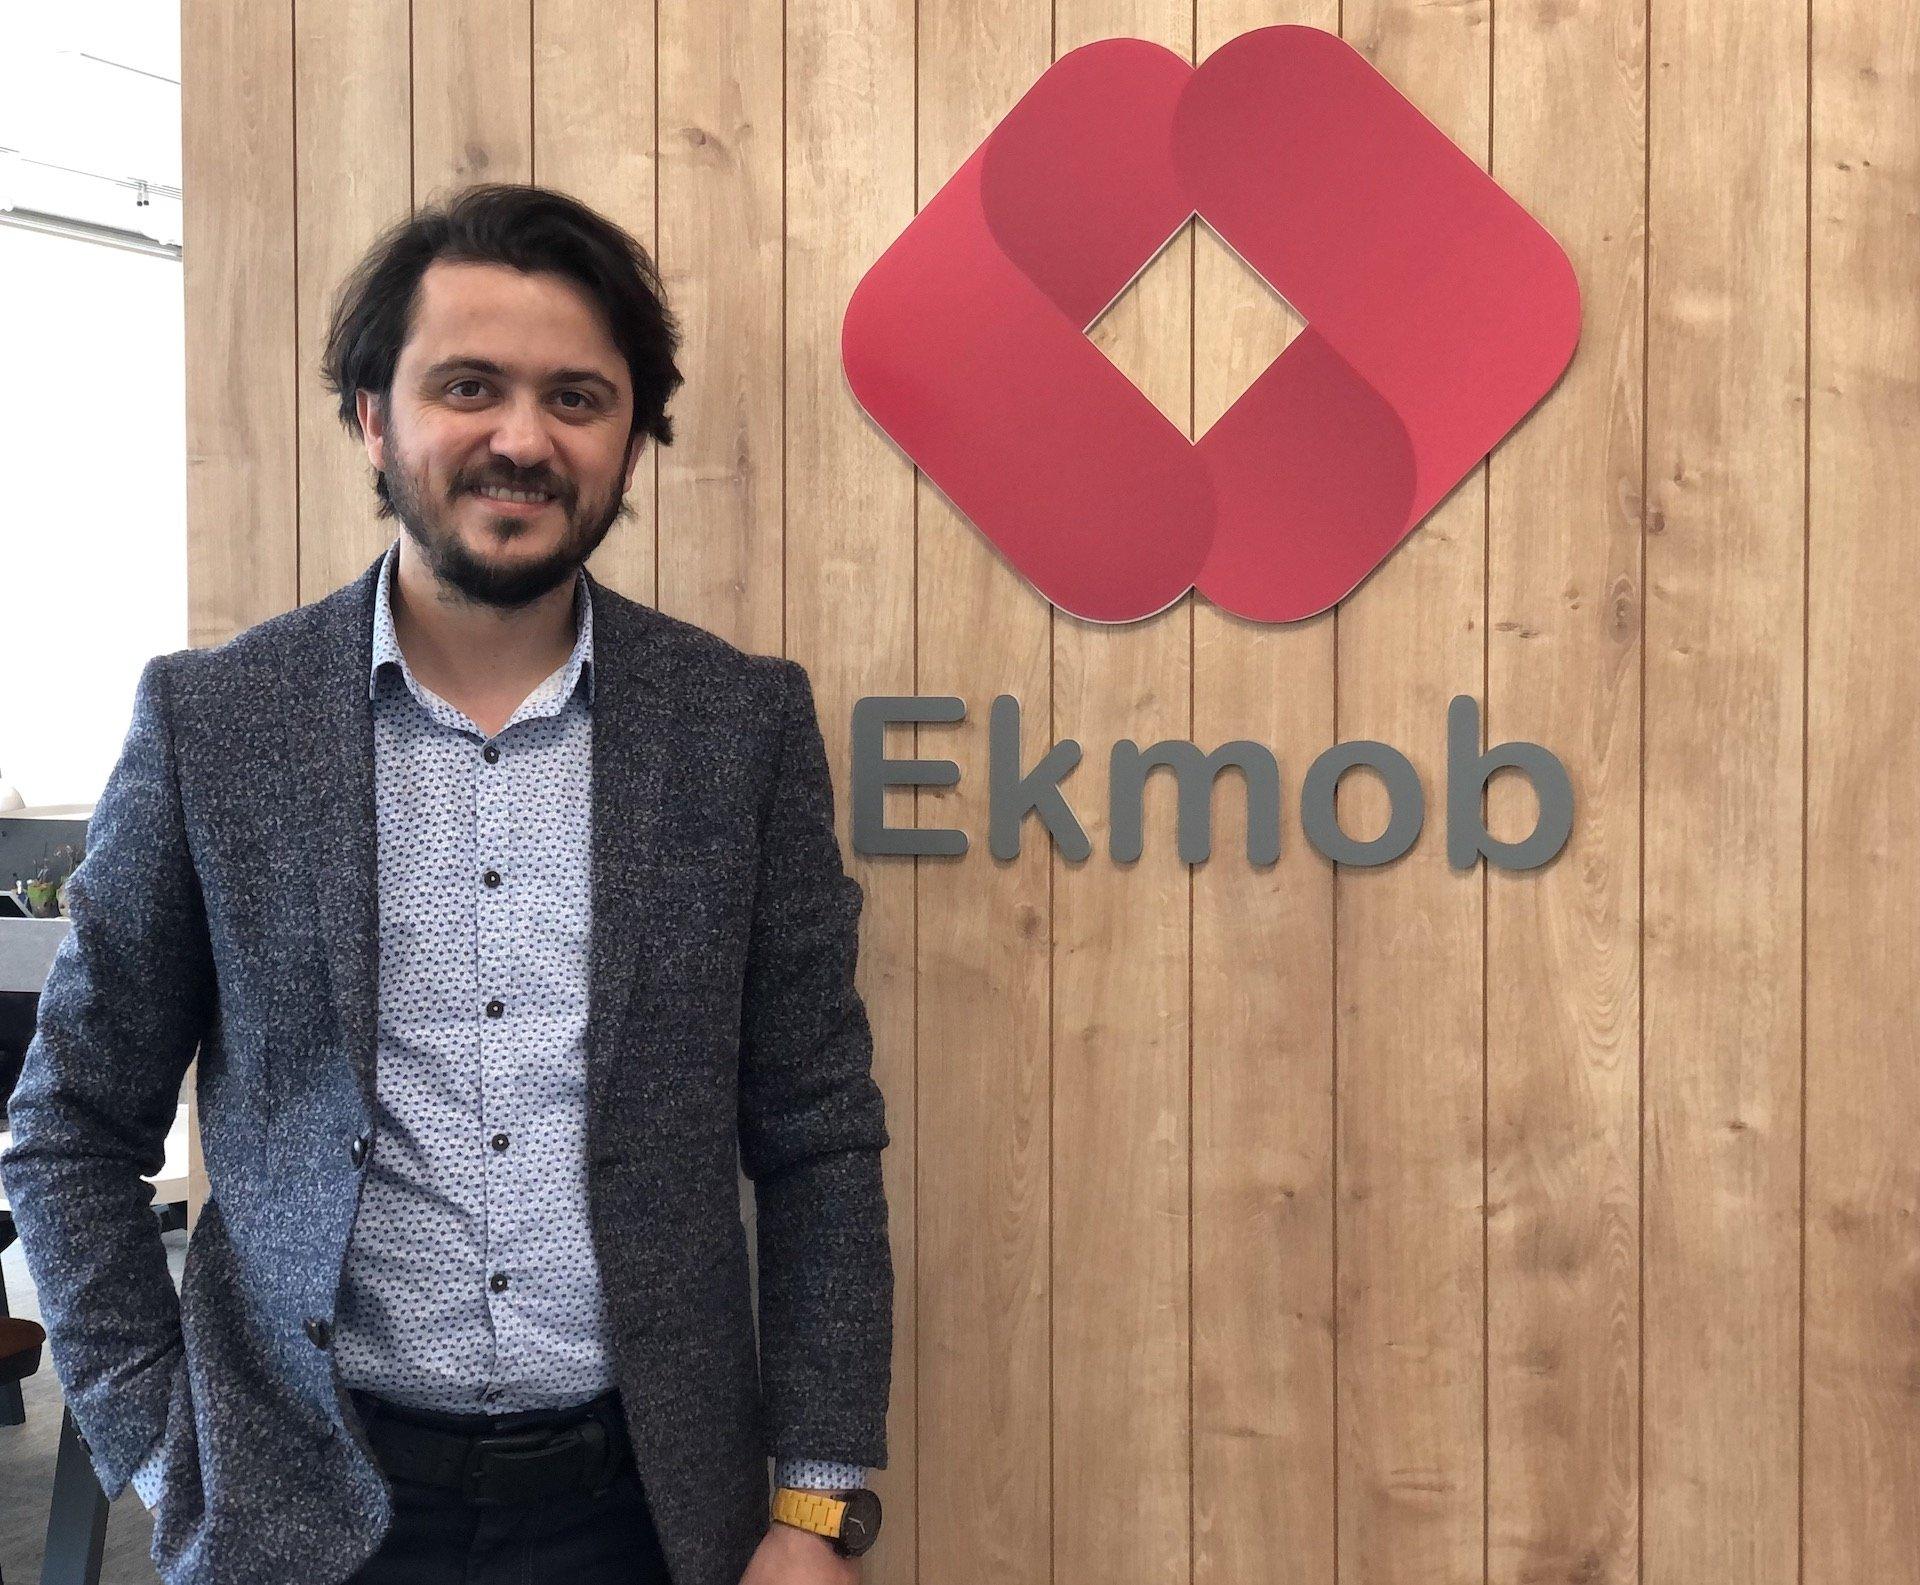 Ekmob Founder and CEO Sunay Şener.